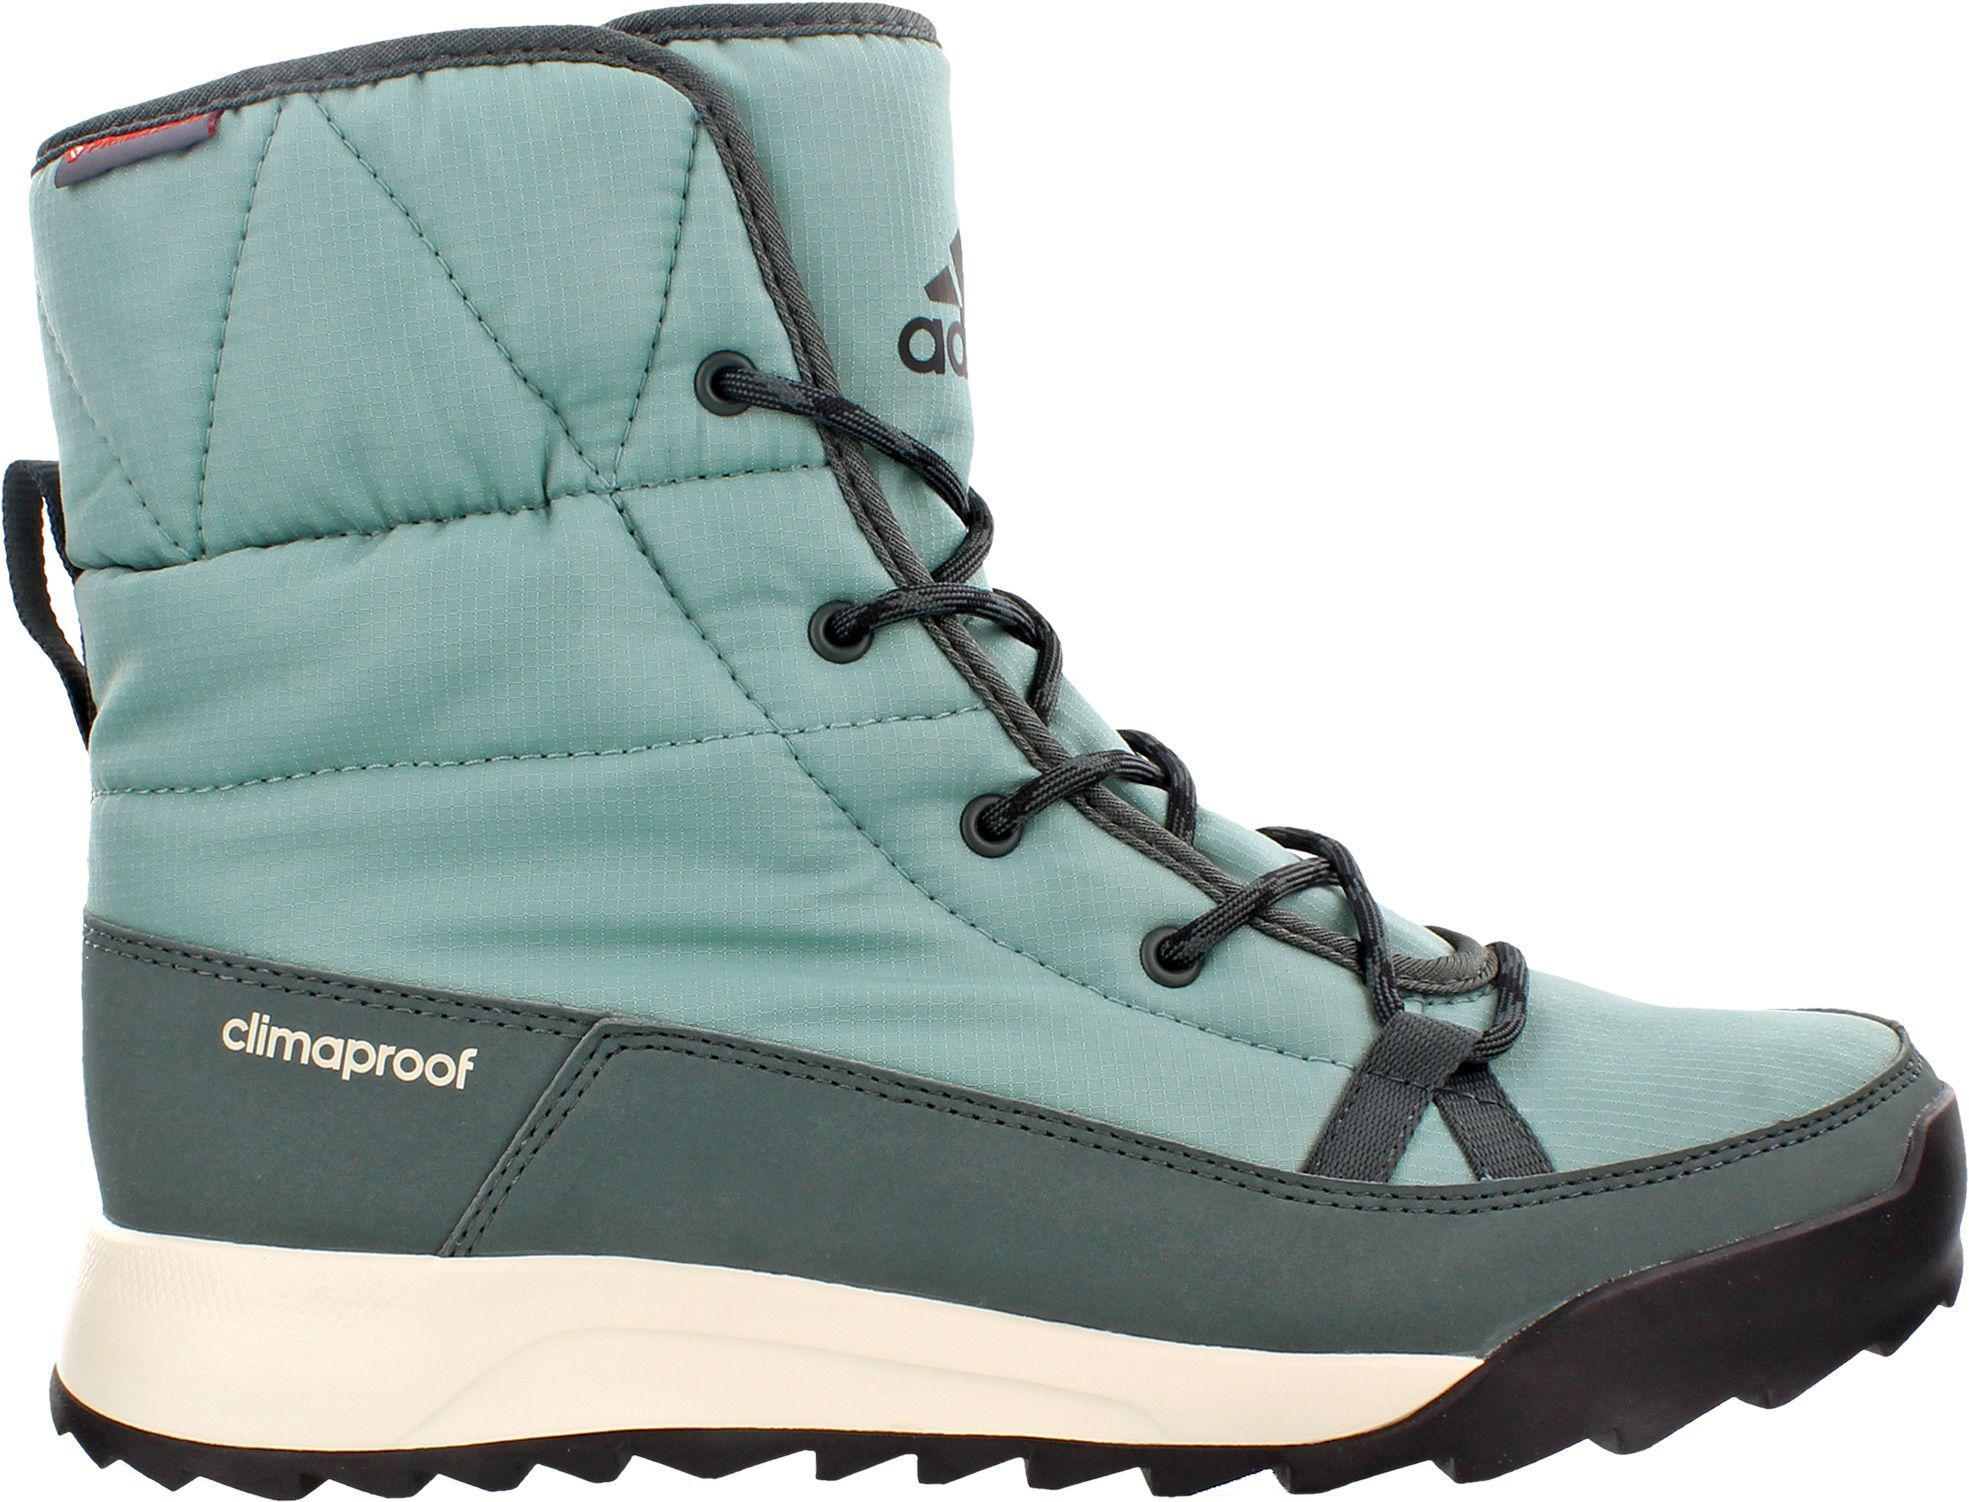 Lyst adidas outdoor cw choleah climaproof 100g stivali invernali per gli uomini.